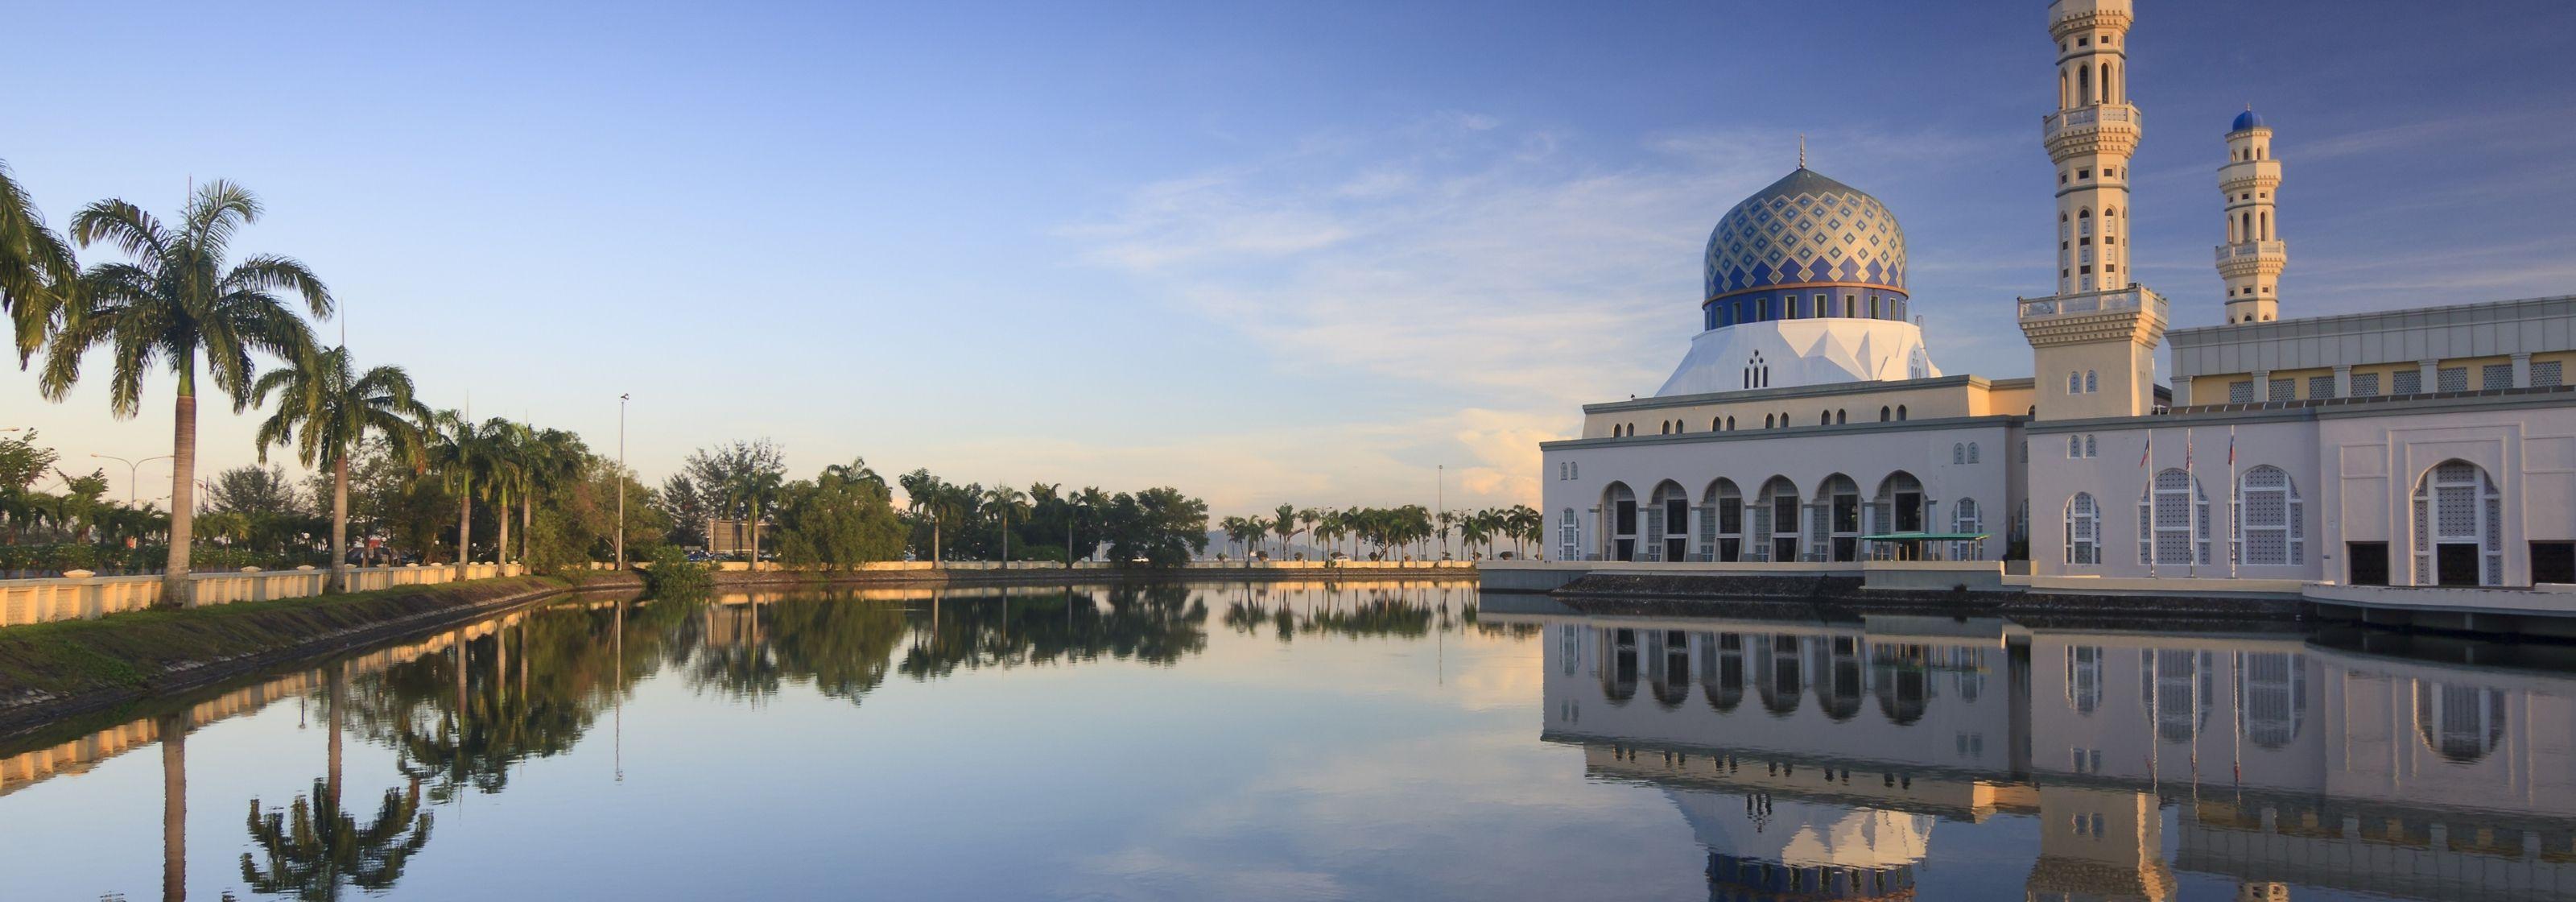 Choses à faire à Kota Kinabalu